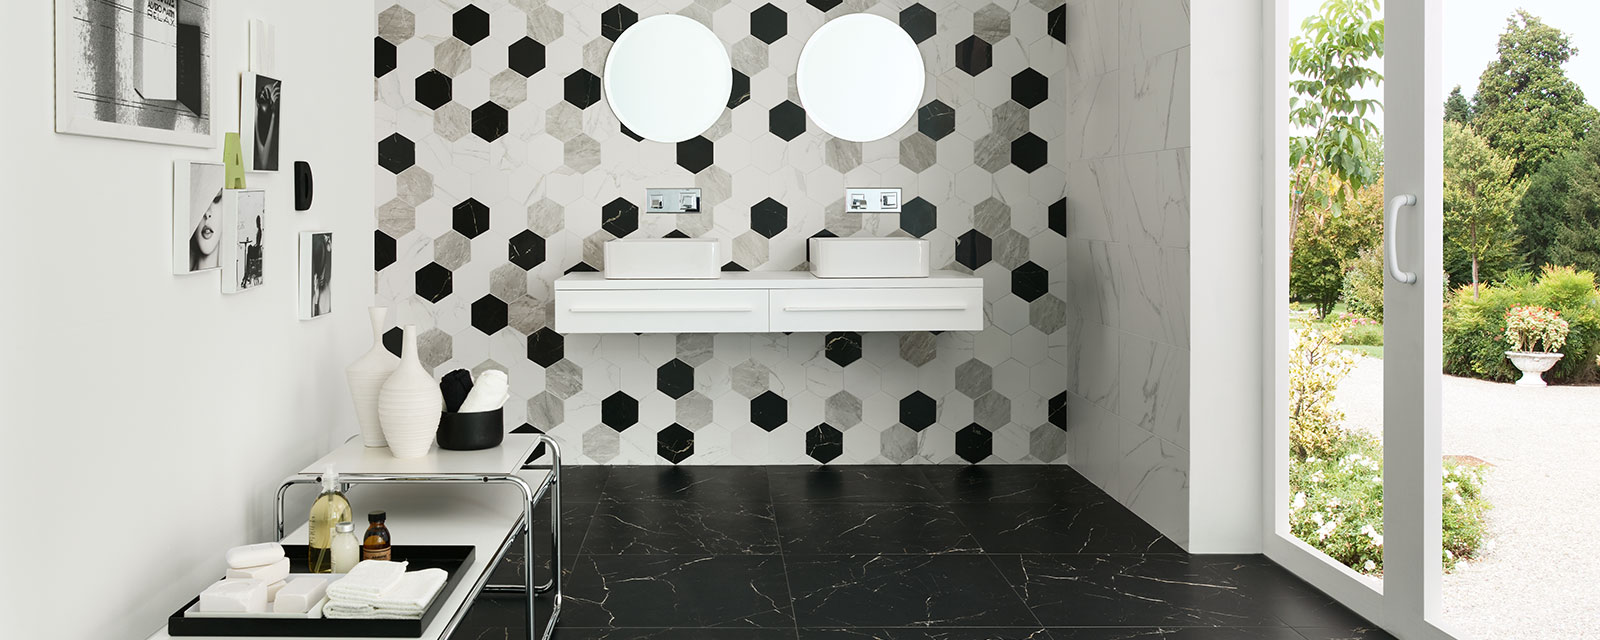 Type De Salle De Bain carrelage hexagonal dans la salle de bains | guide artisan